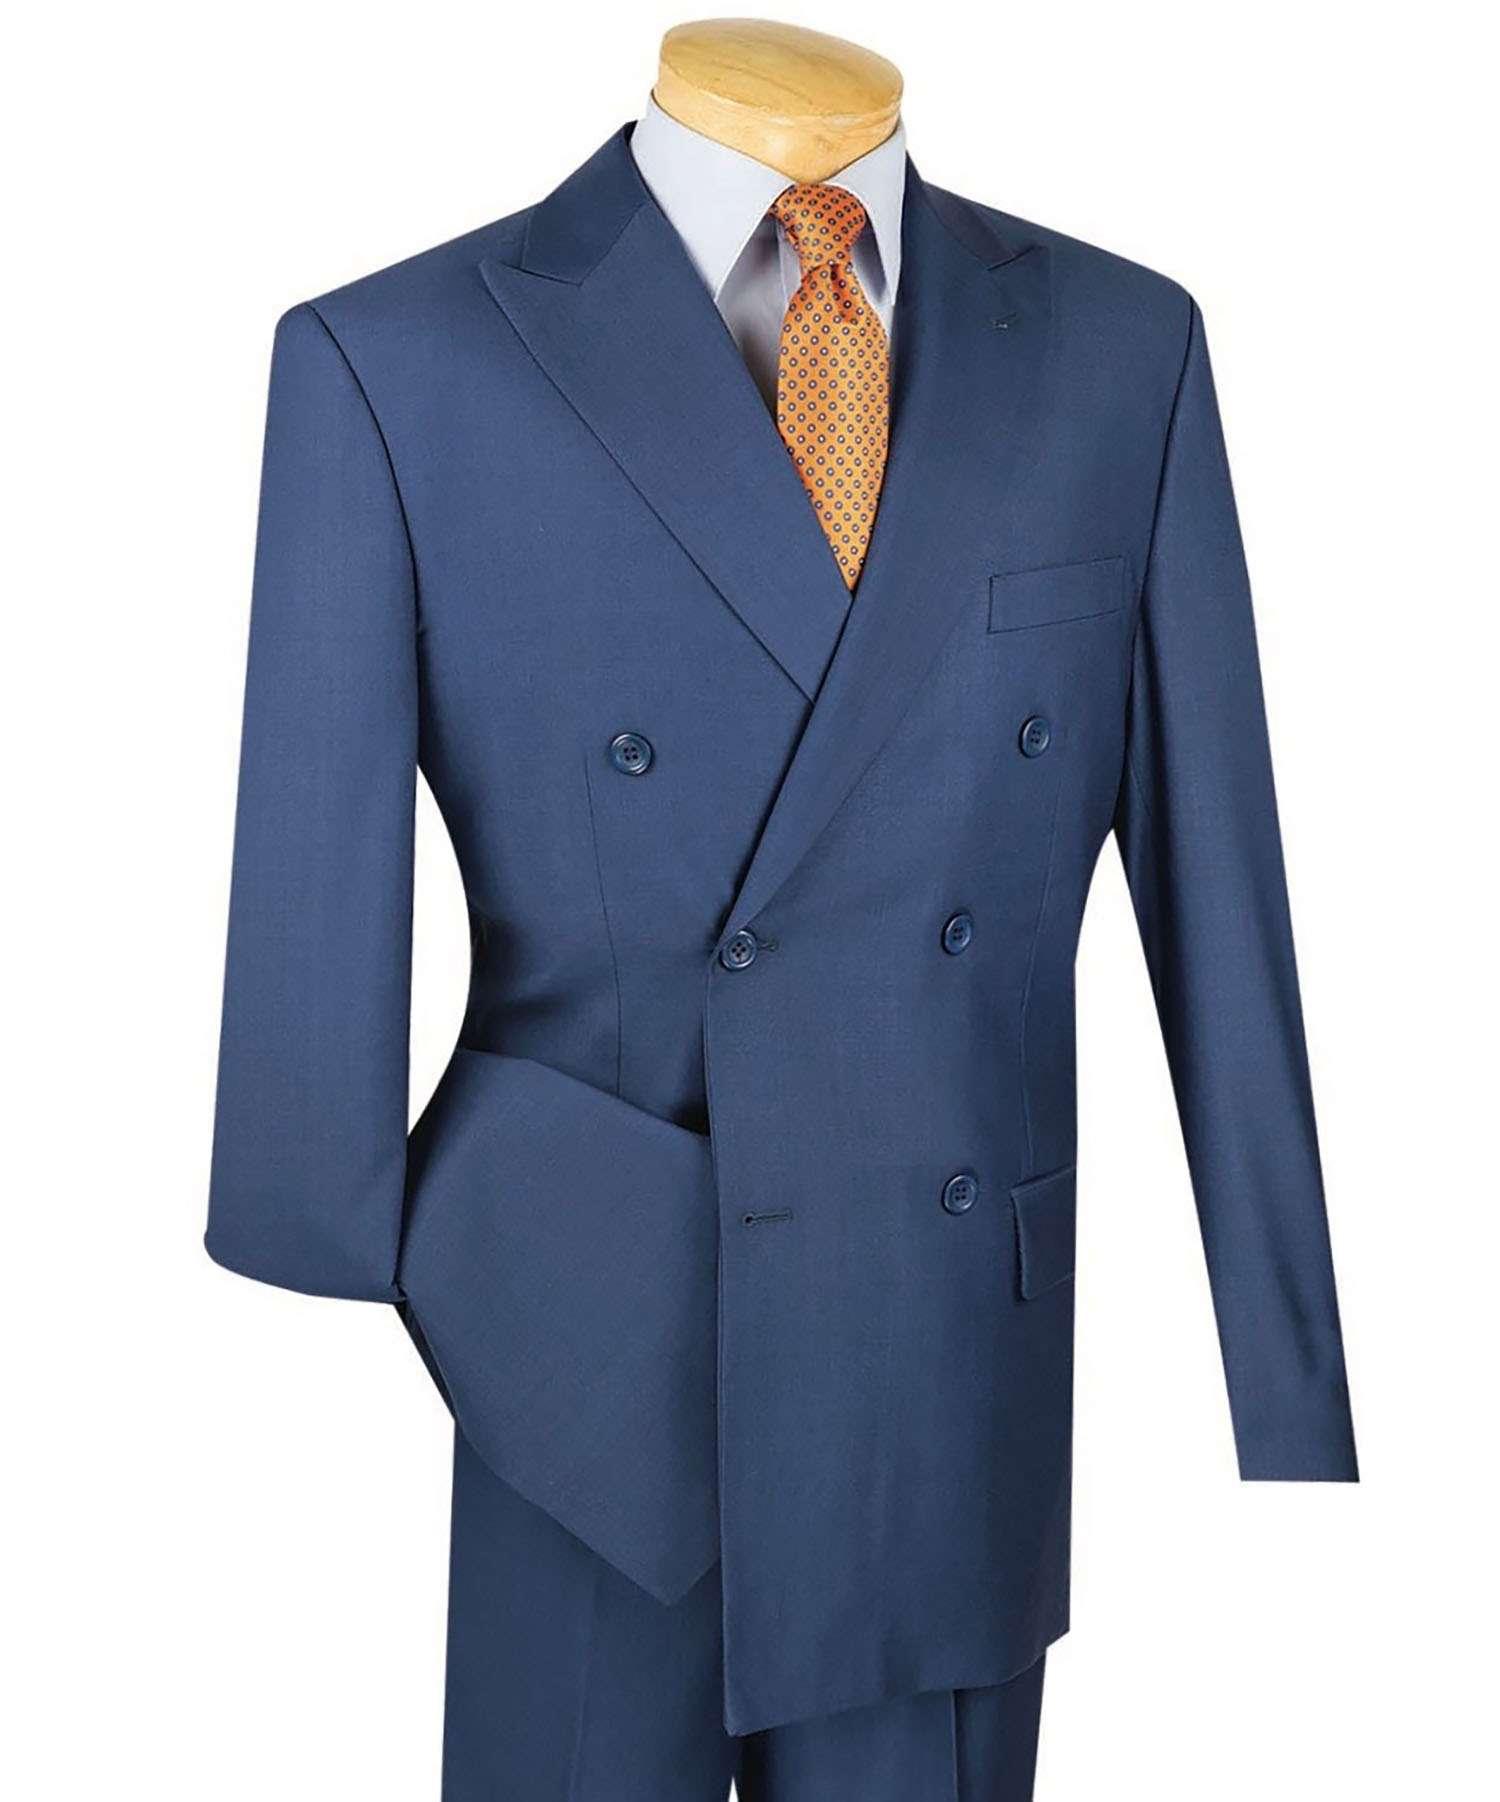 Vinci Men\'s Blue Double Breasted 6 Button Classic-Fit Suit NEW | eBay